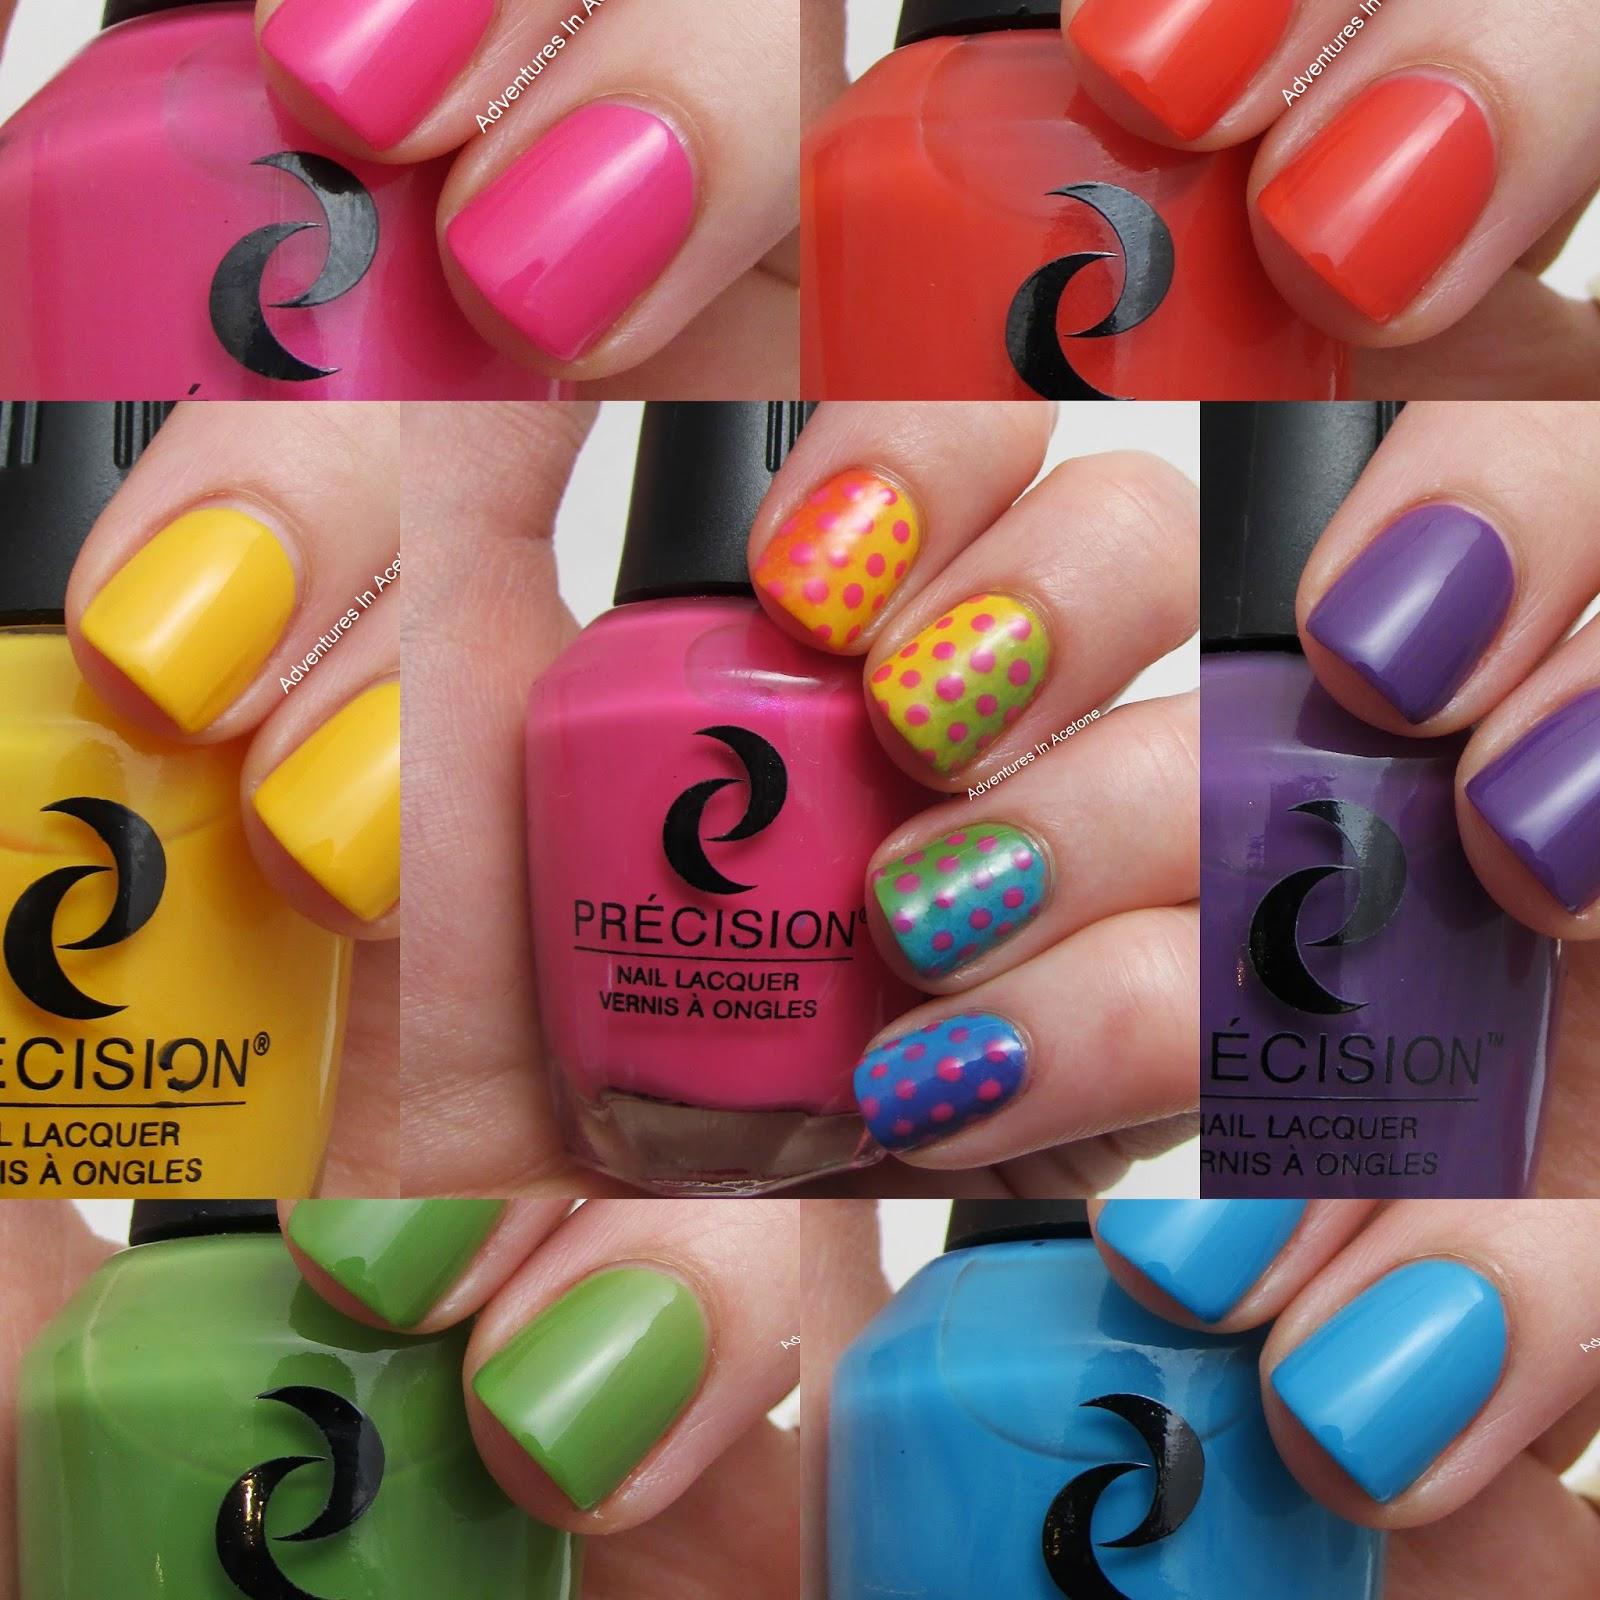 Vertical Grant Precision Nail Lacquer Color Fx Collection